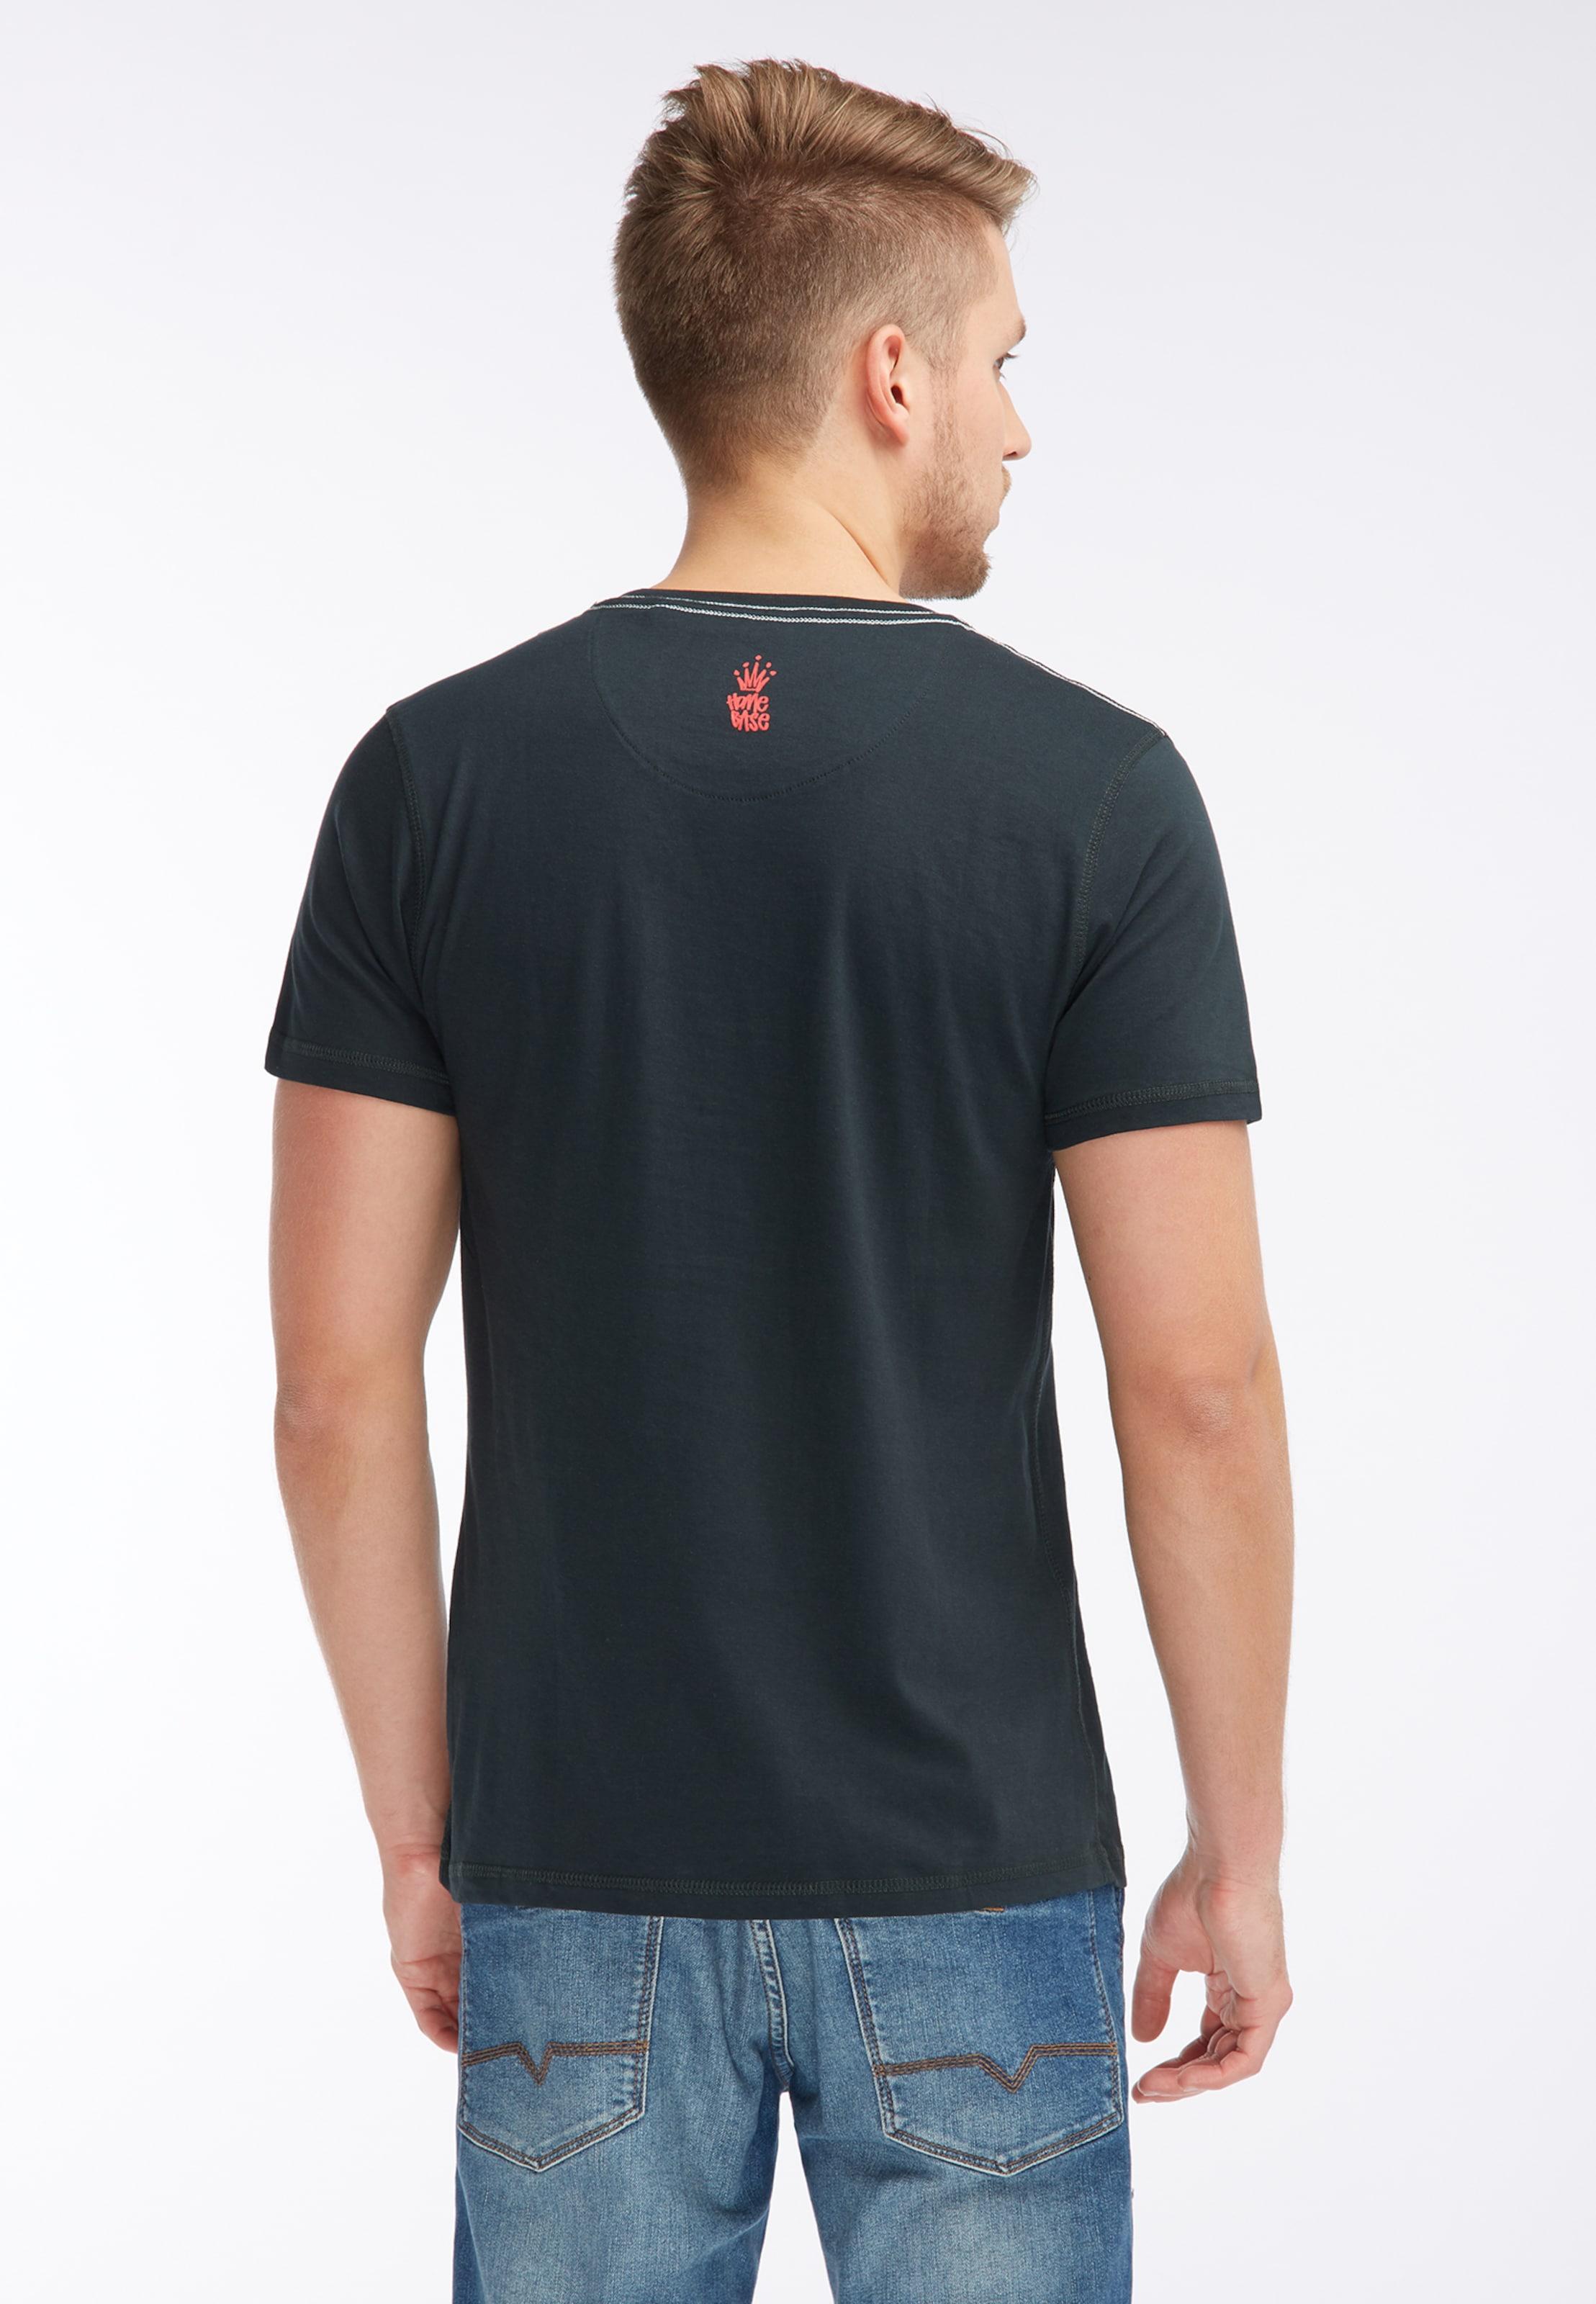 Émeraude T Homebase T shirt En Homebase shirt 4c3j5RALq